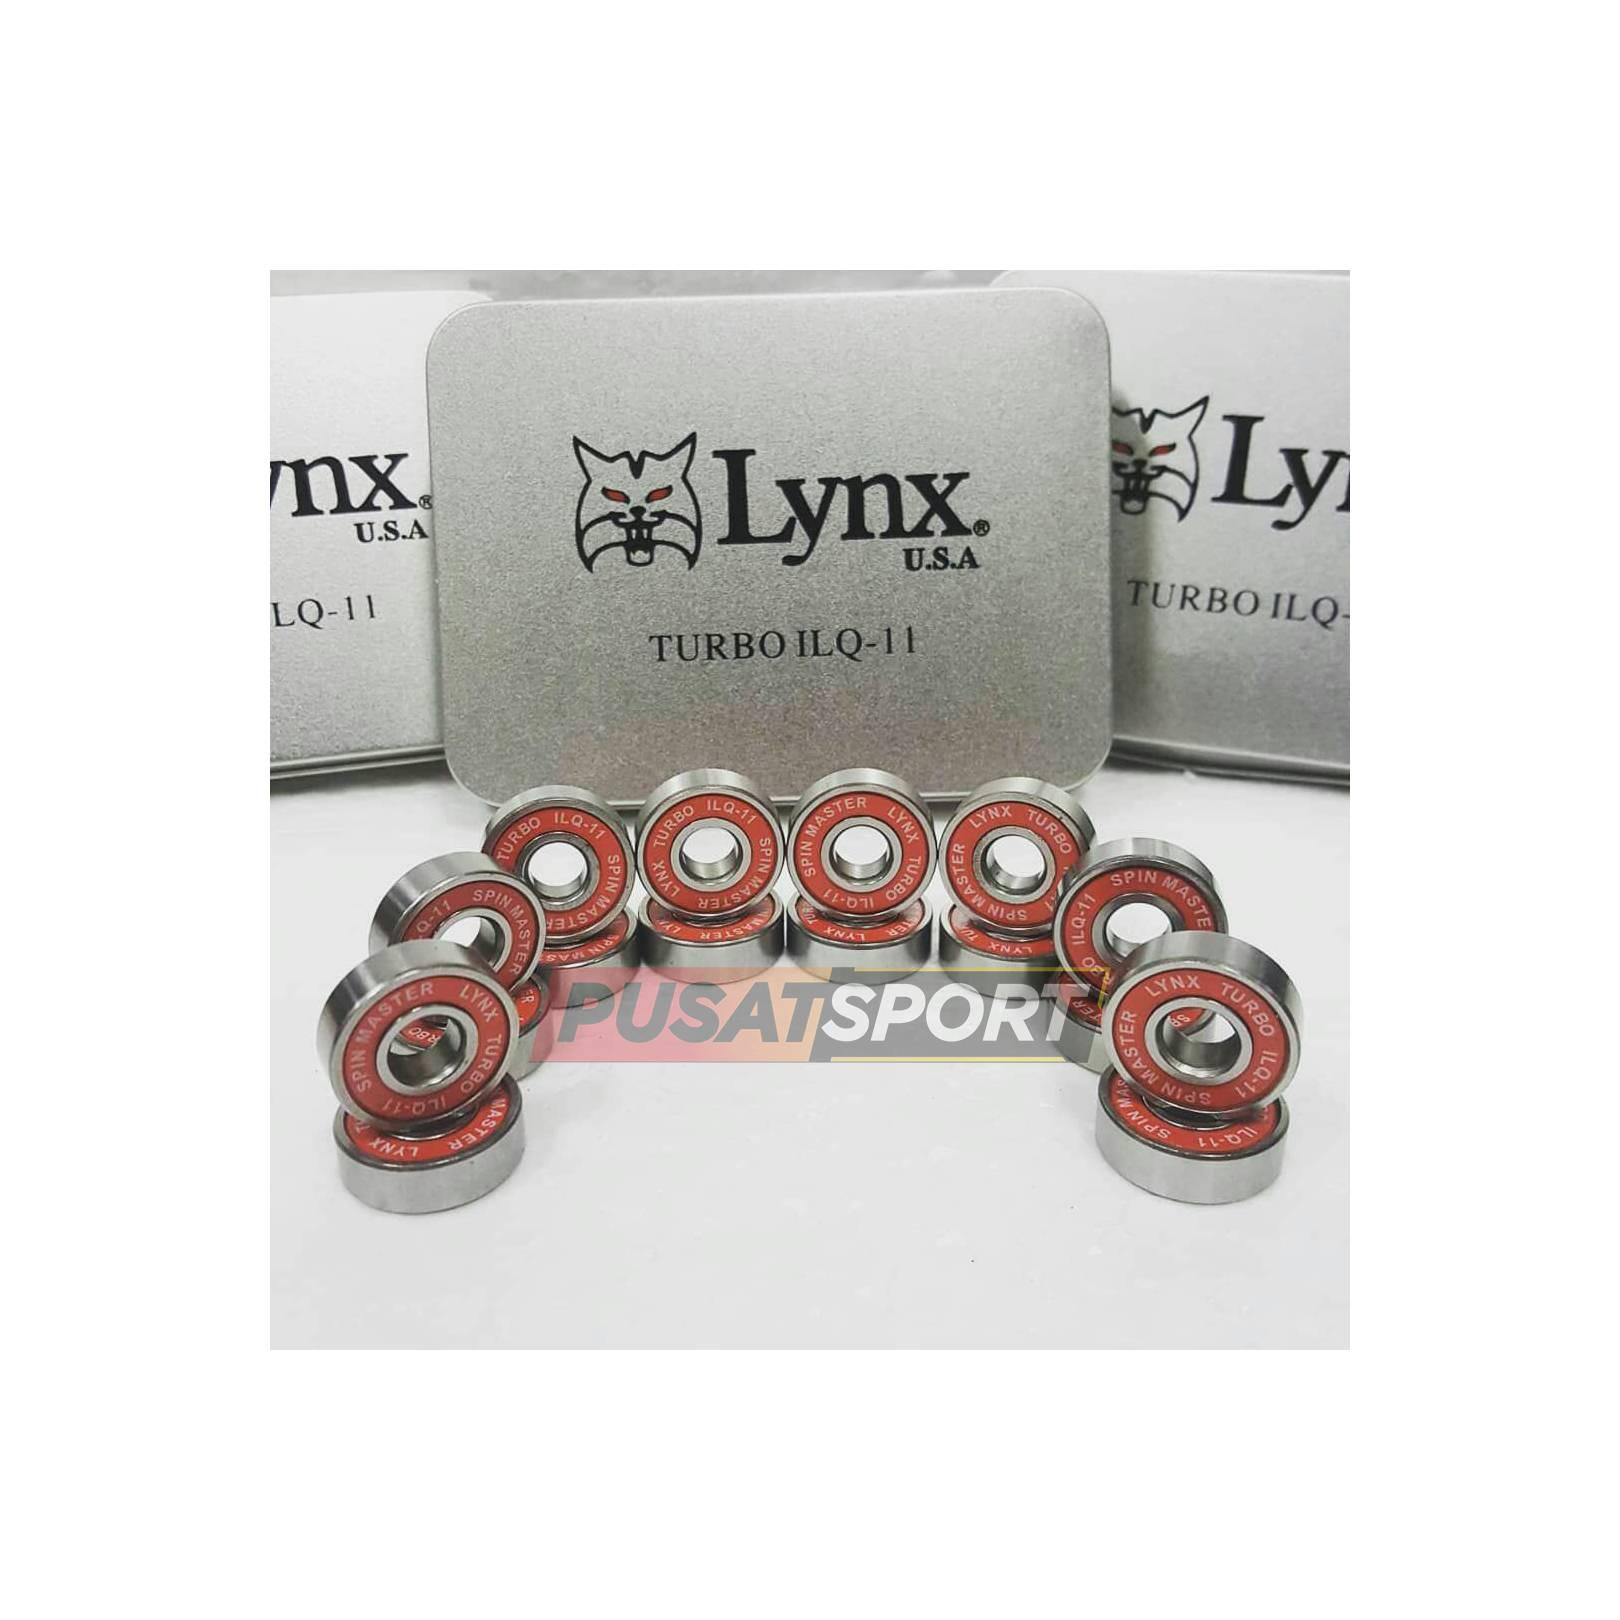 Sprepart Sepatu Roda Lynx Turbo IC Merah